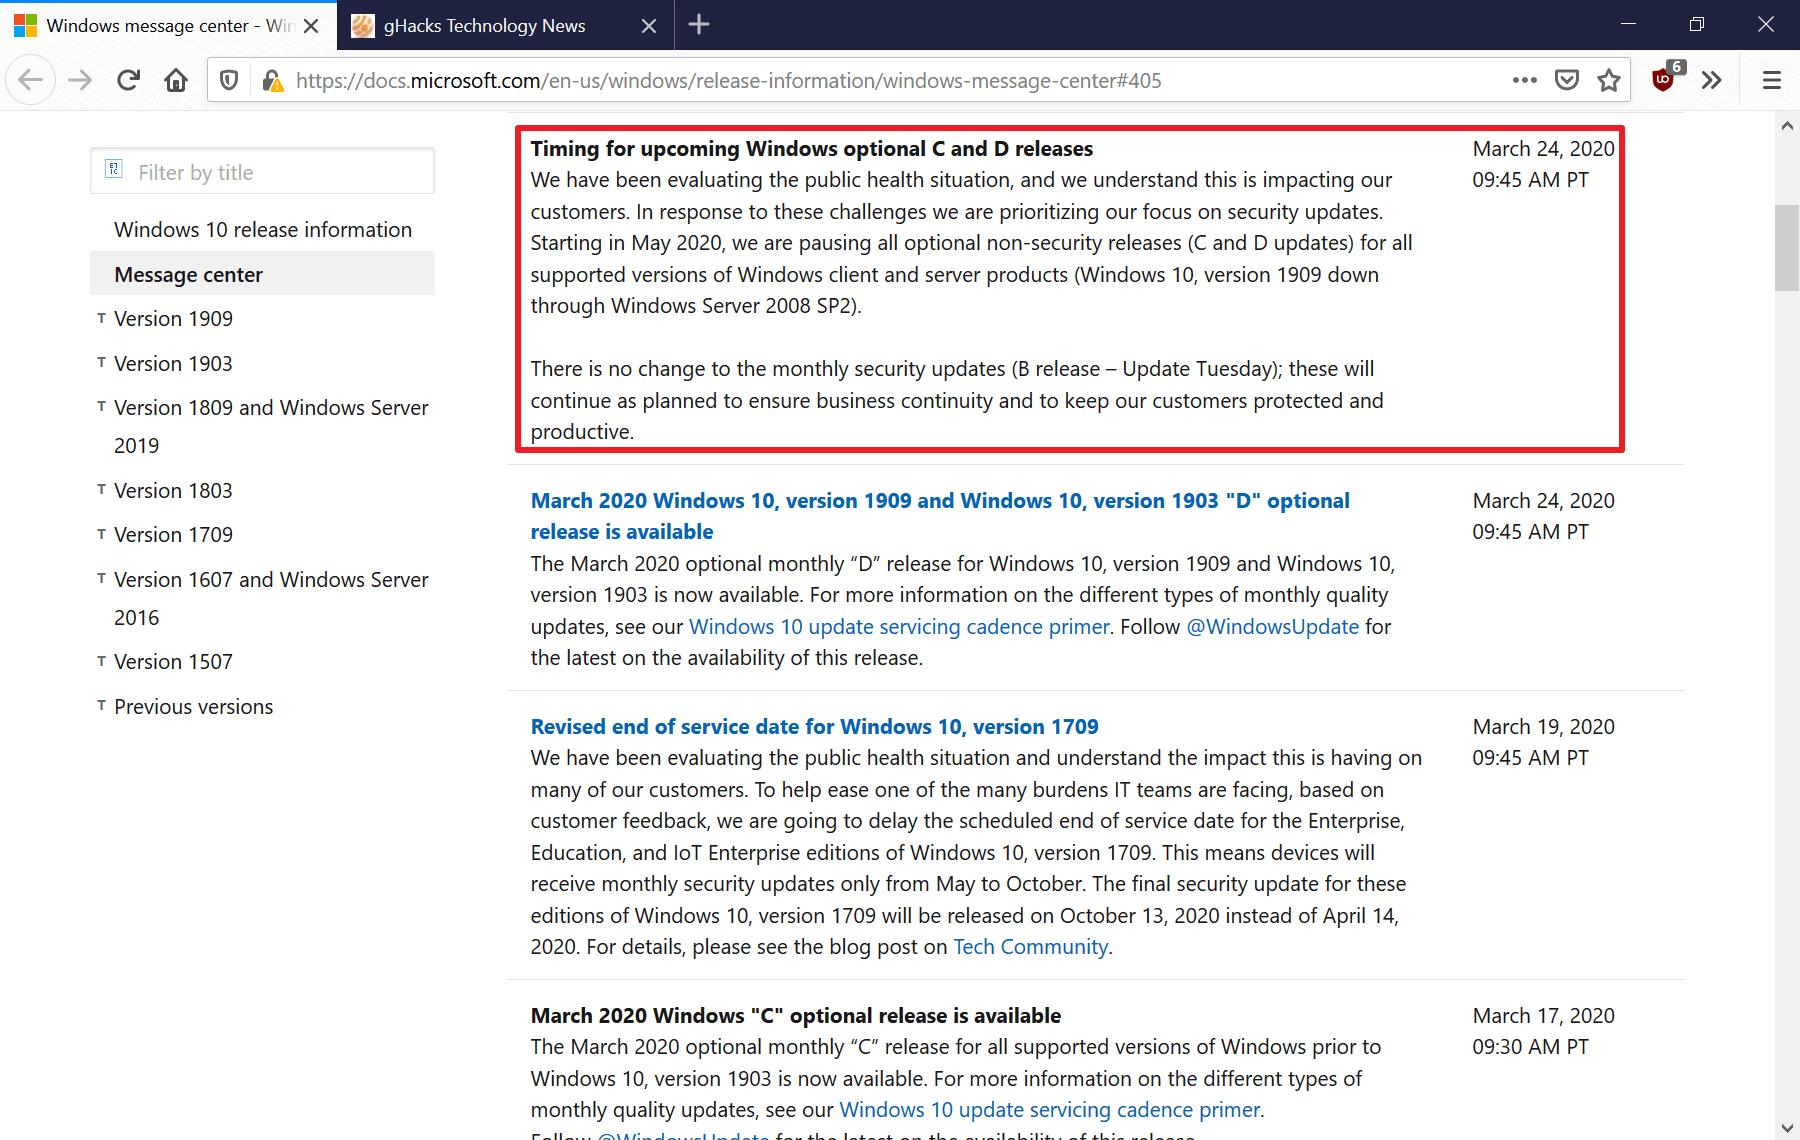 windows pause optional updates